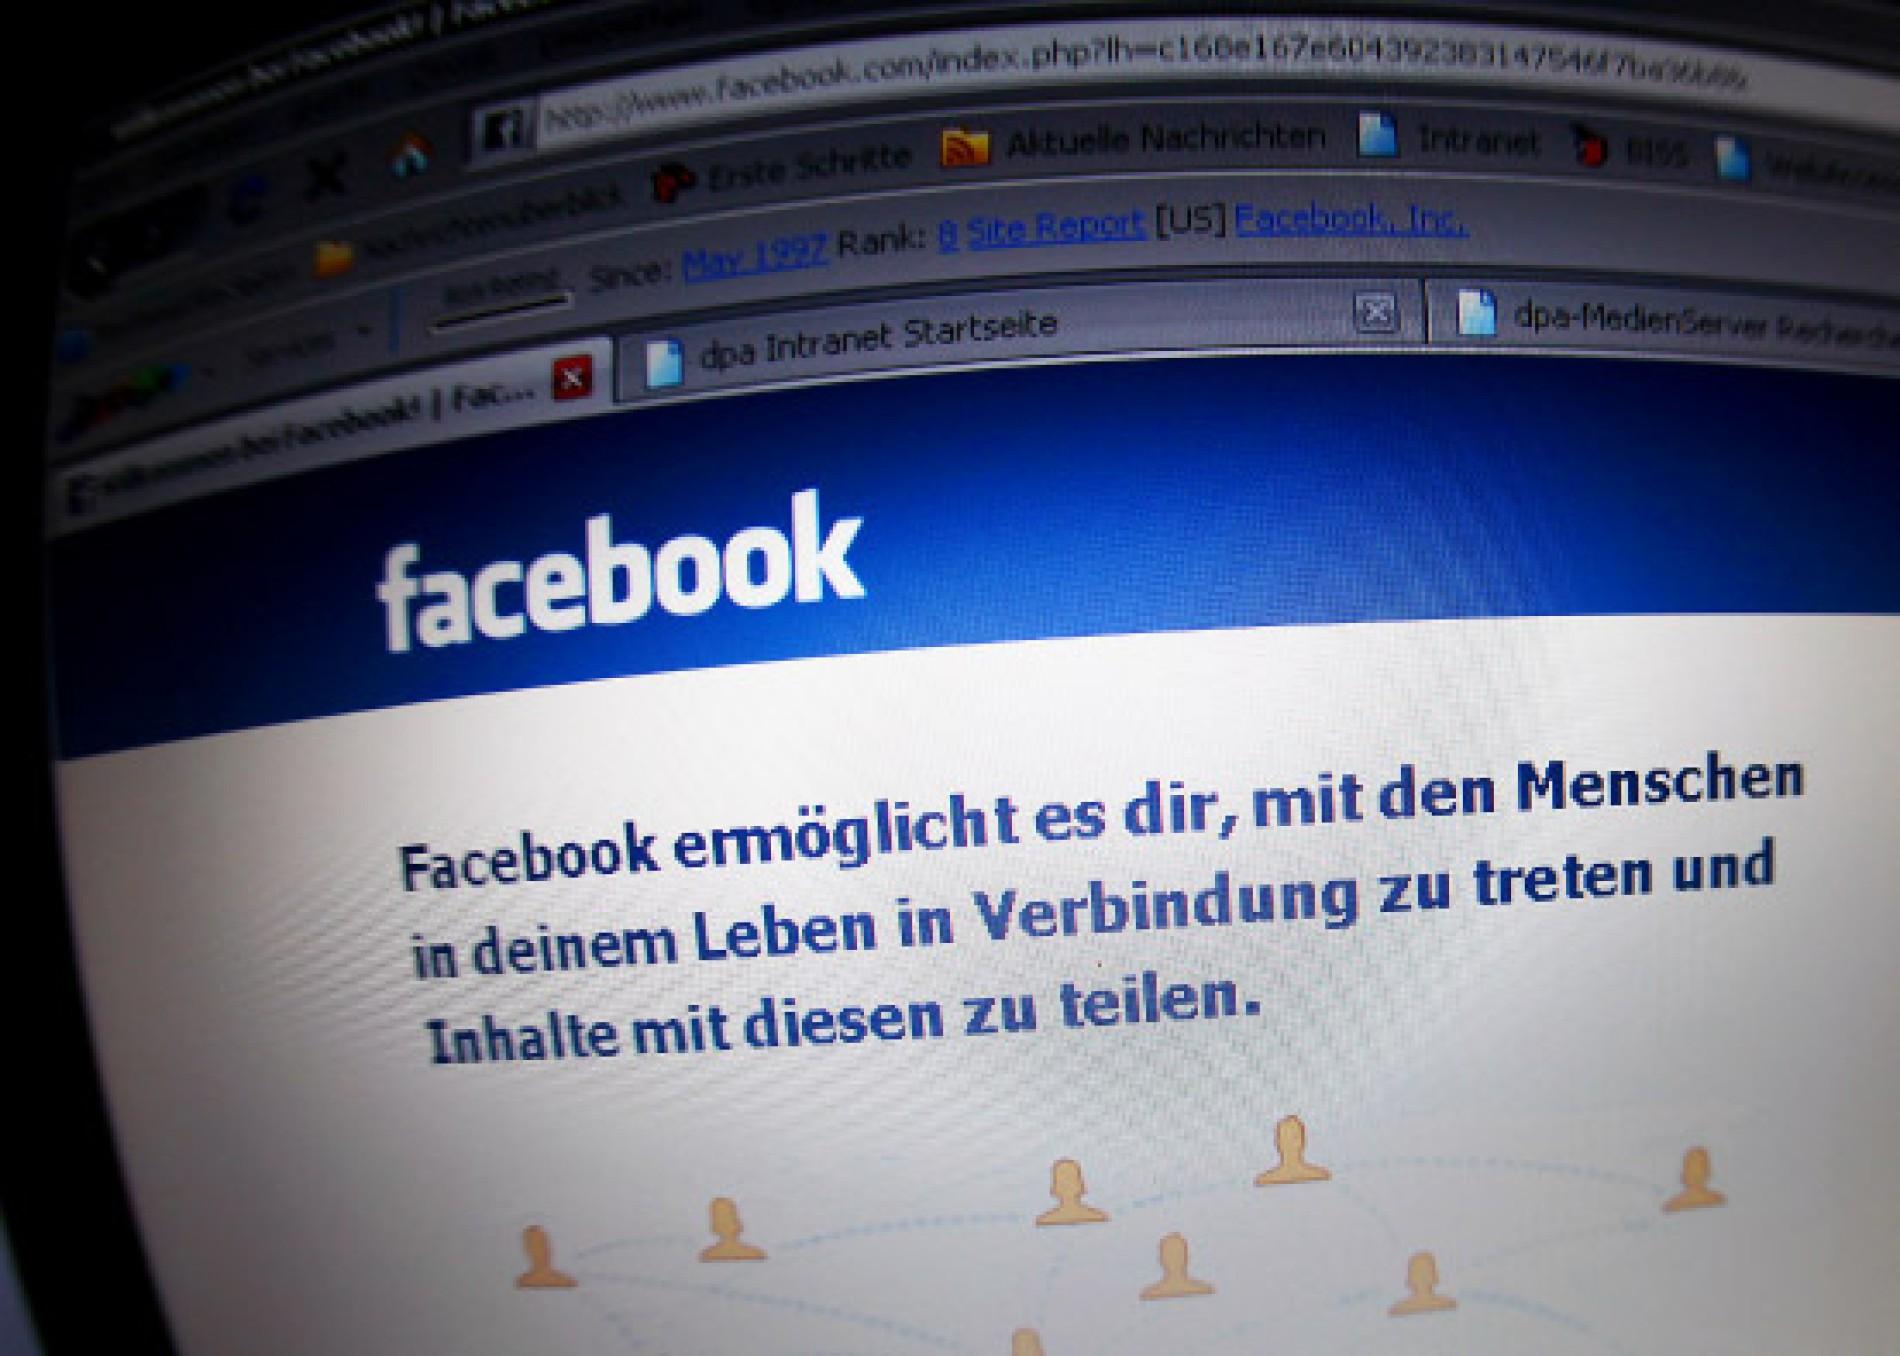 Freundschaftsvorschläge facebook bekommen beide